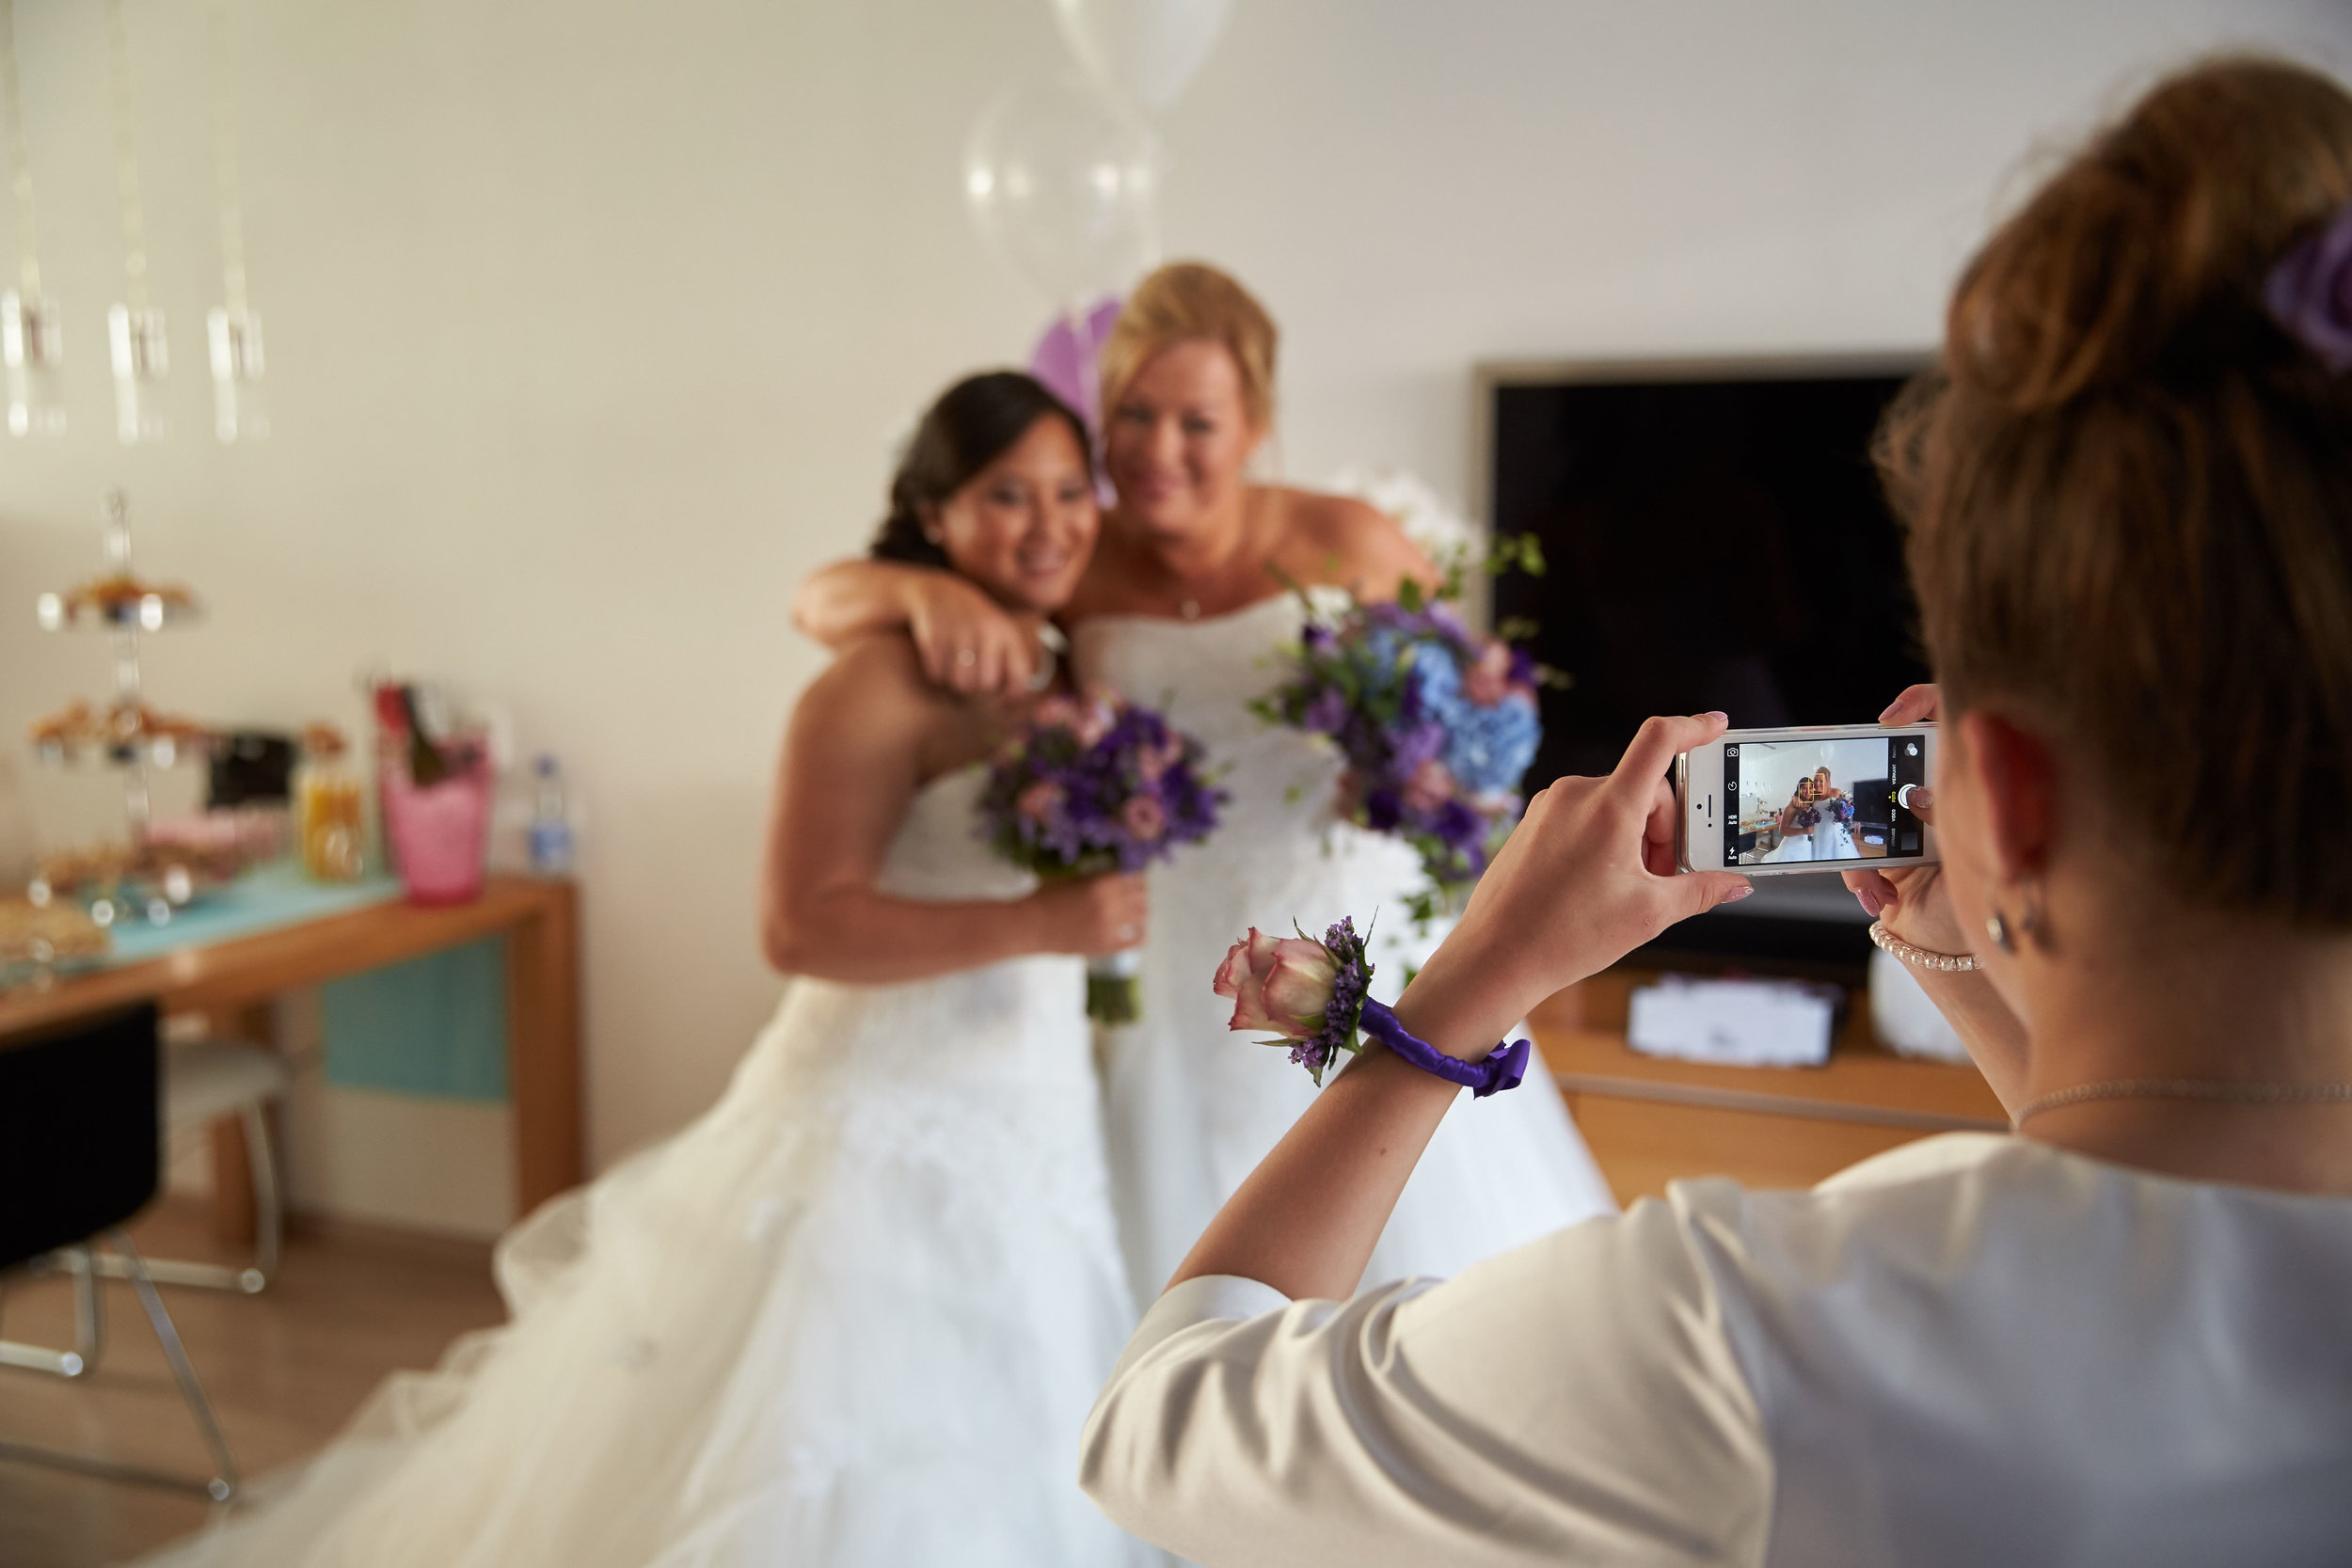 trouwshoot-bruidsfotografie-trouwfoto-feestfotografie-Prunella en Cora11.jpg